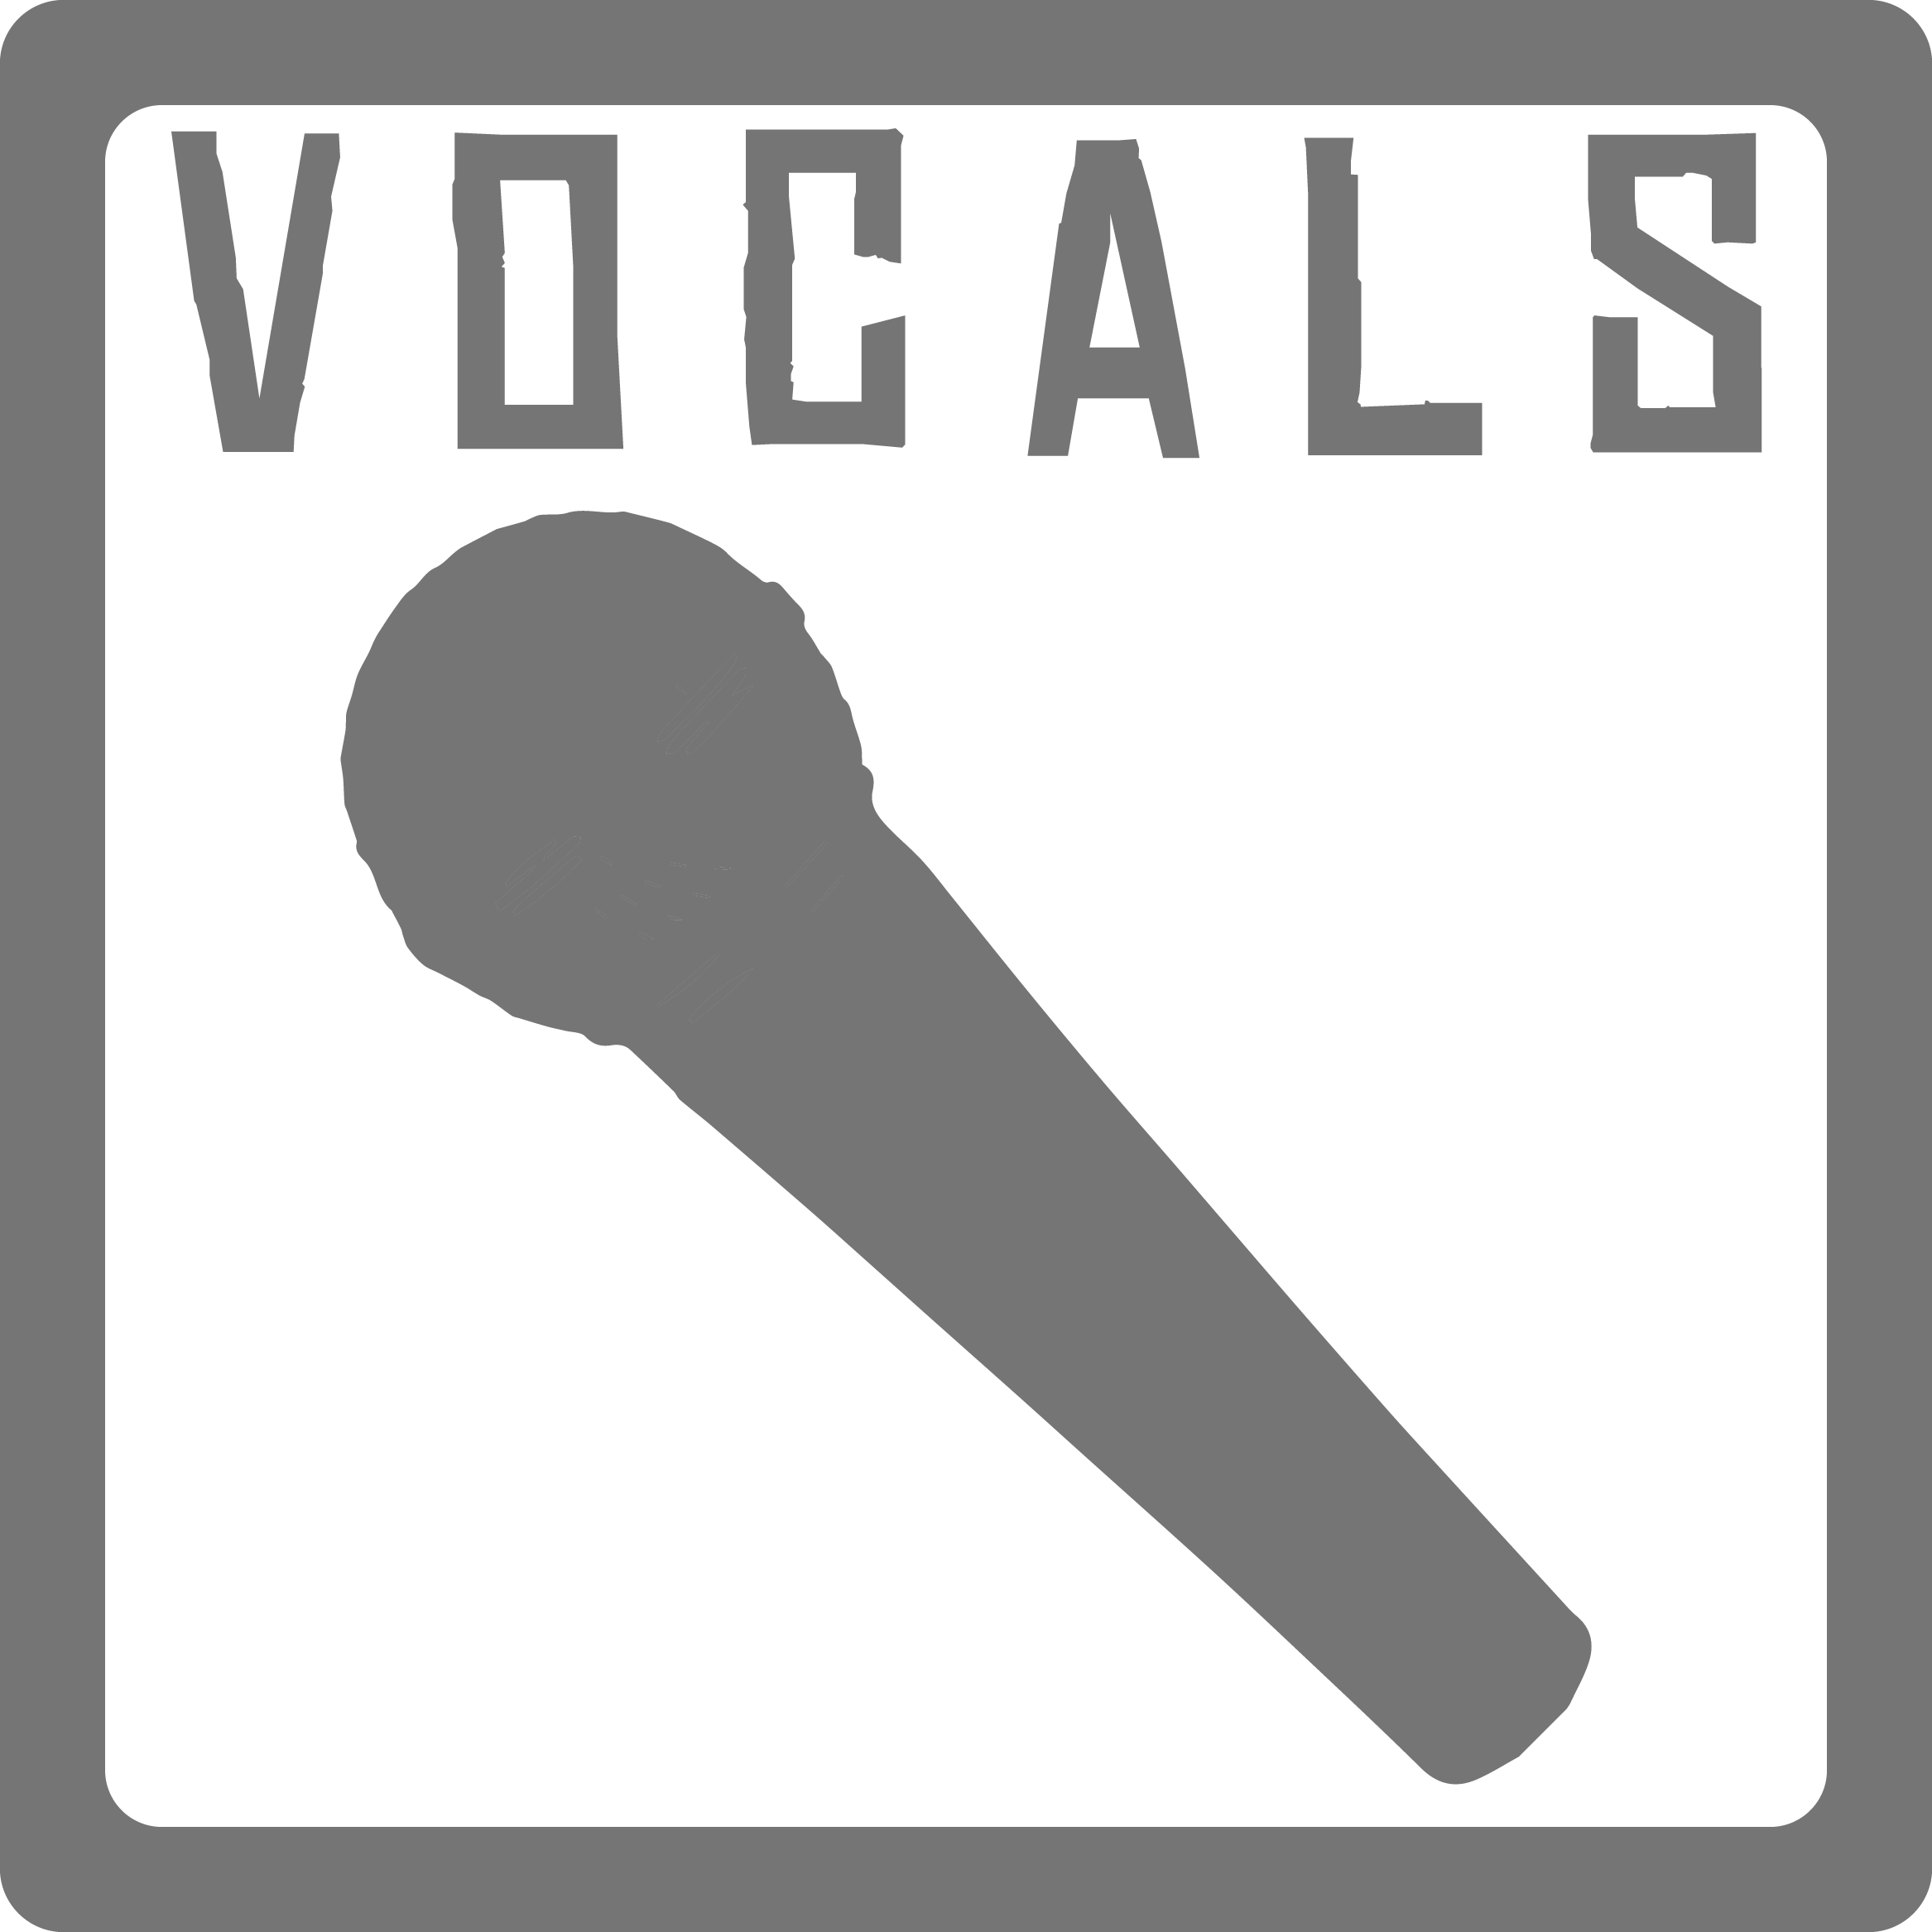 Vocals Button.png